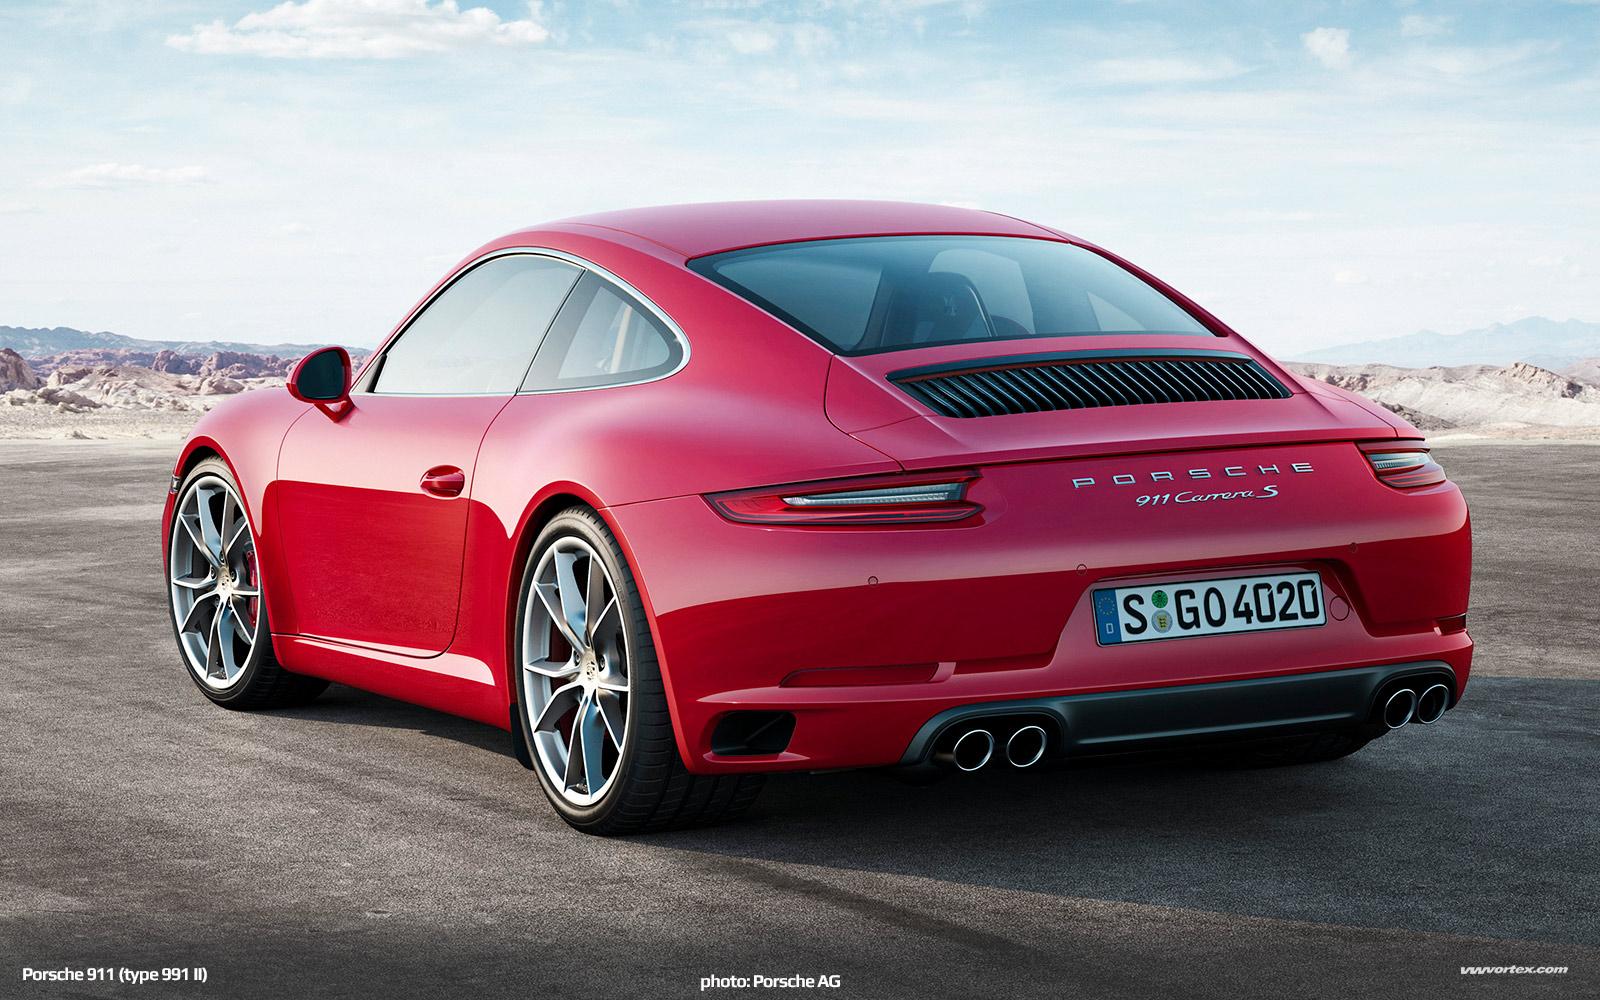 Porsche-911-991-ii-2016-509